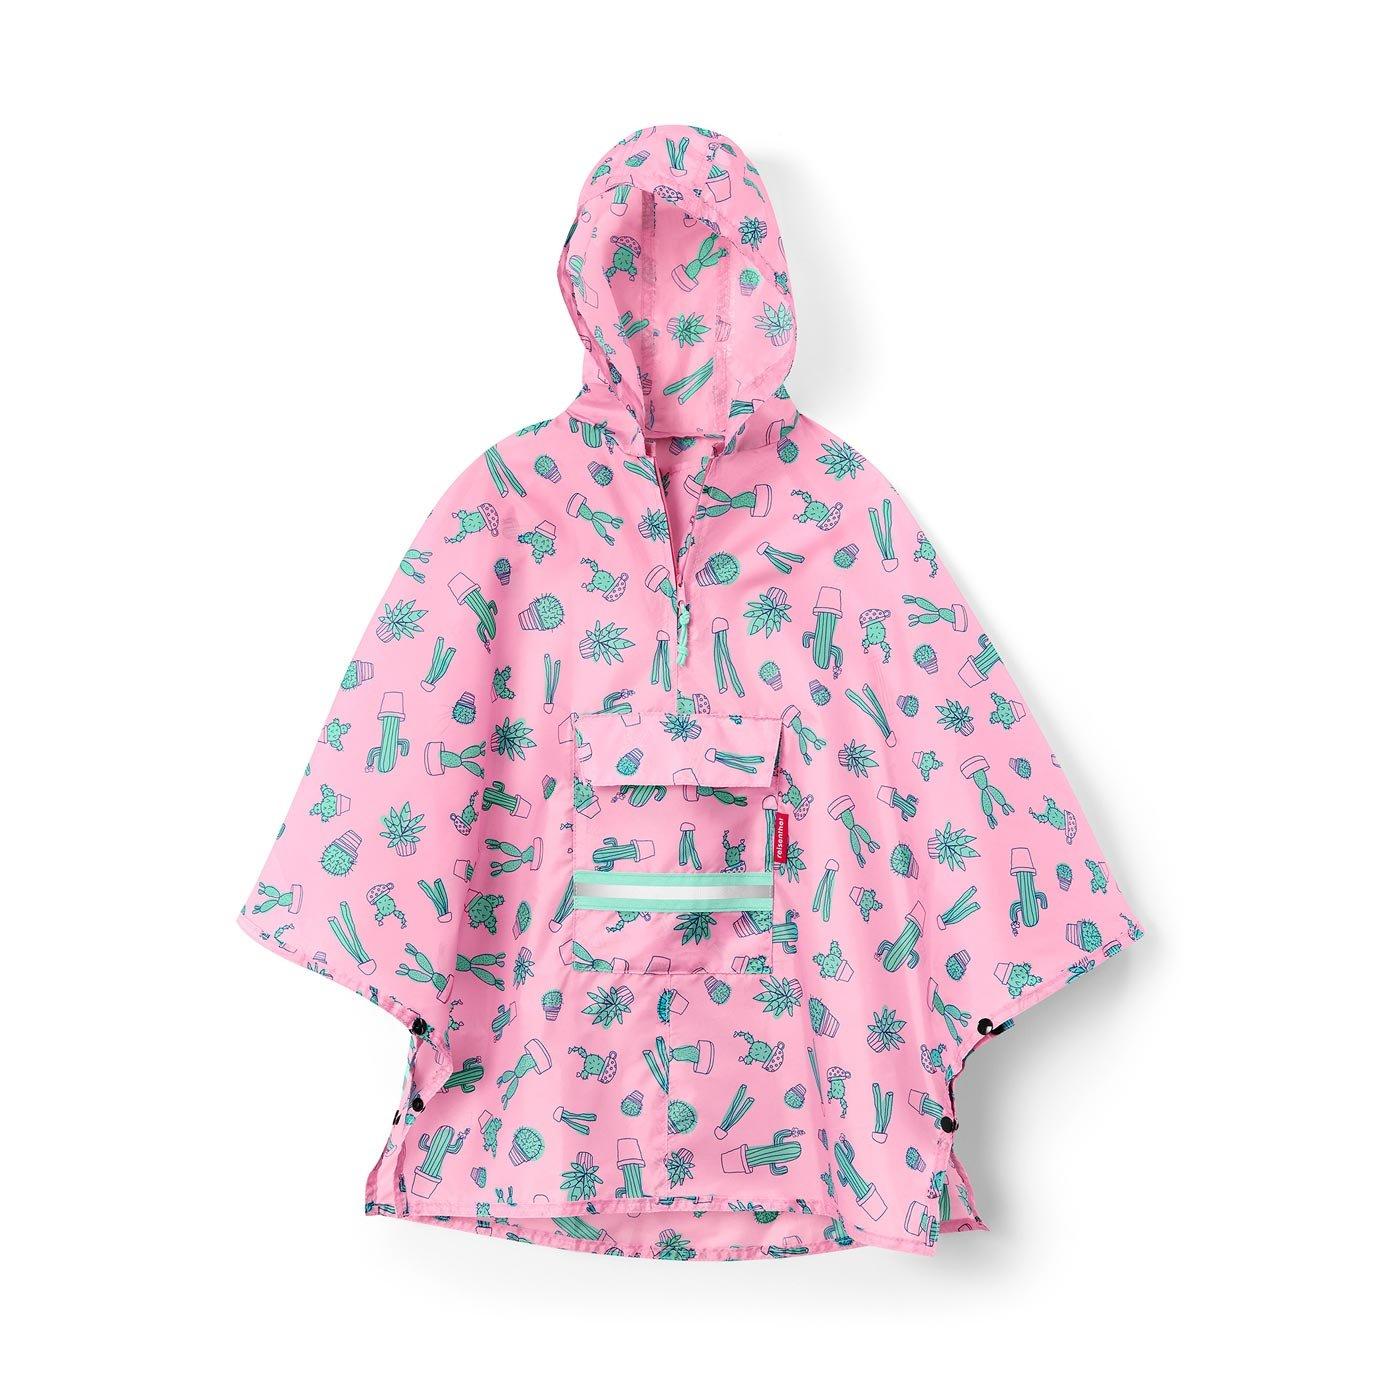 reisenthel Mini Maxi Poncho M Kids, Packable Children's Rain Cloak, Cactus Pink